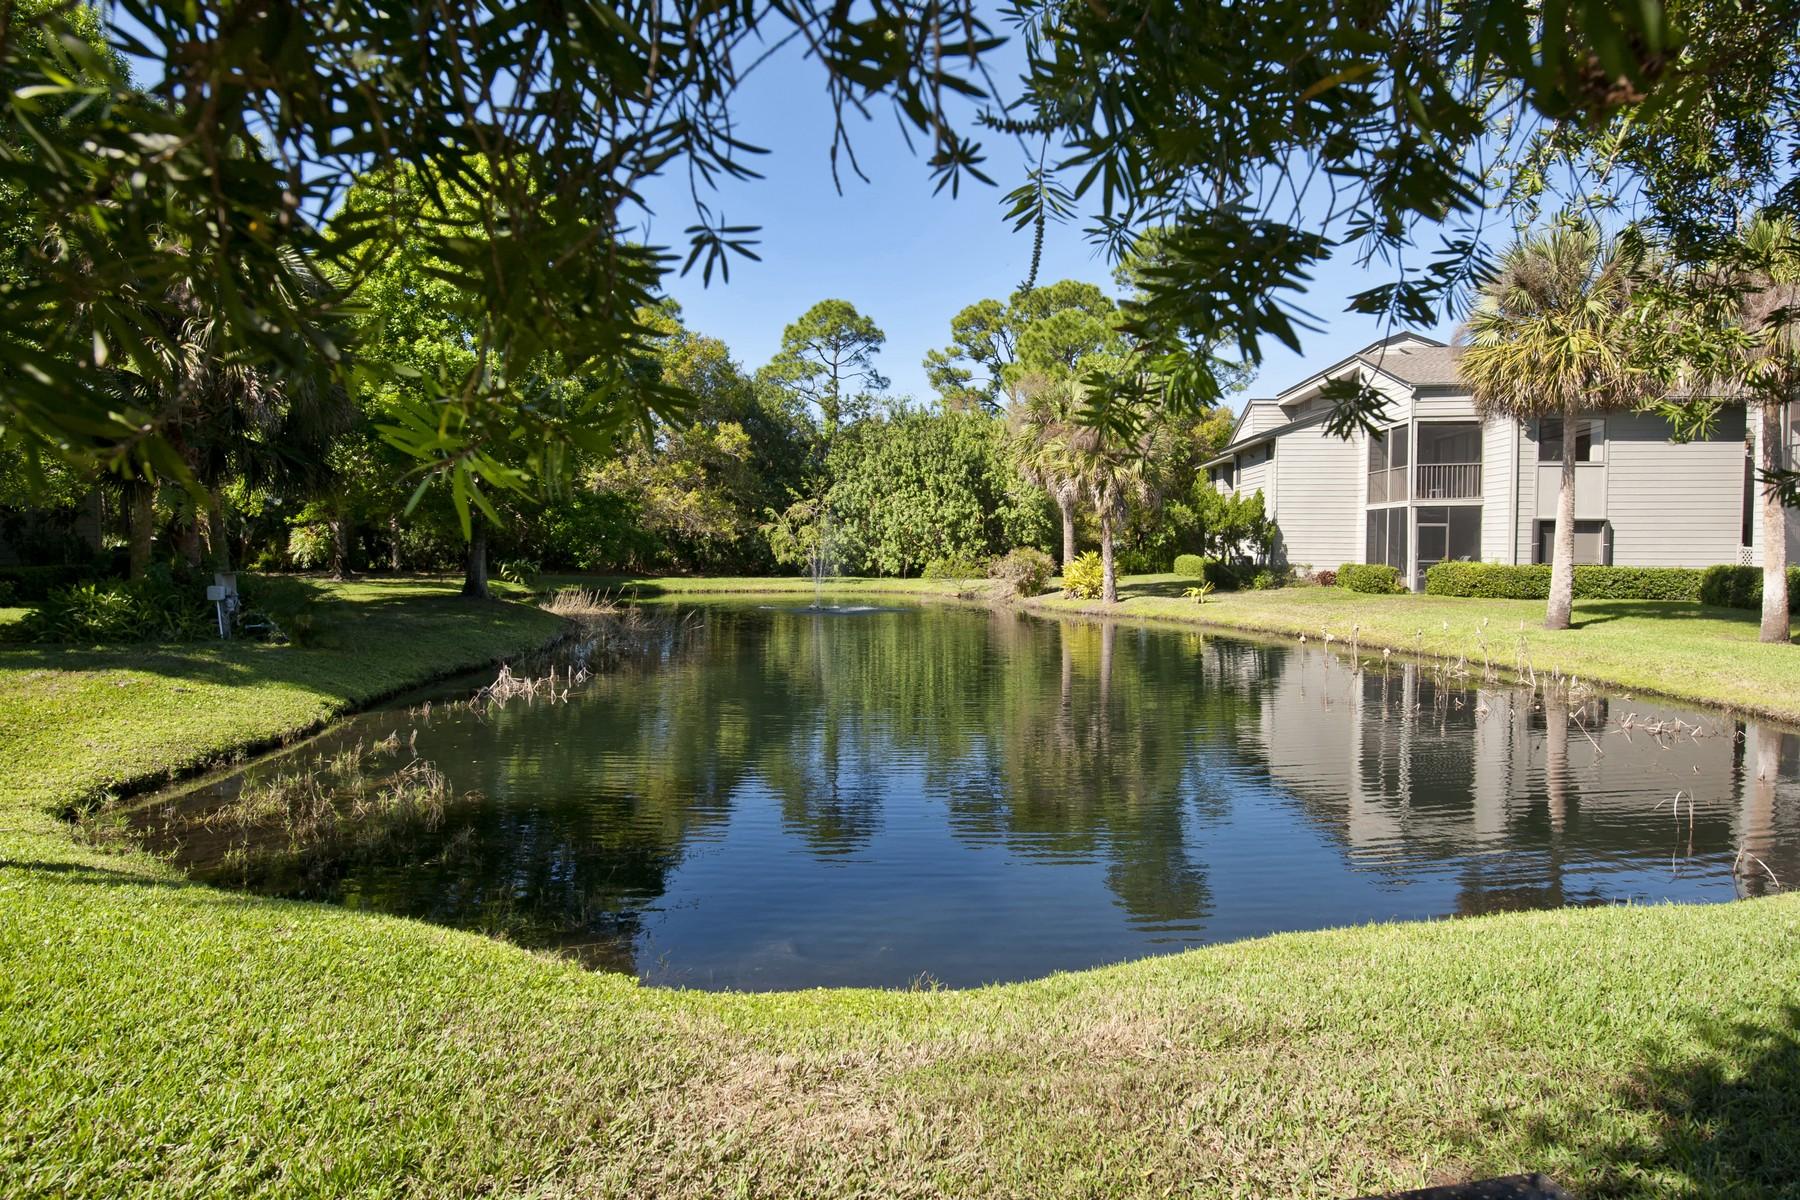 Condominiums for Sale at Lakeside Pine Creek Condo 2125 Pine Creek Boulevard Vero Beach, Florida 32966 United States